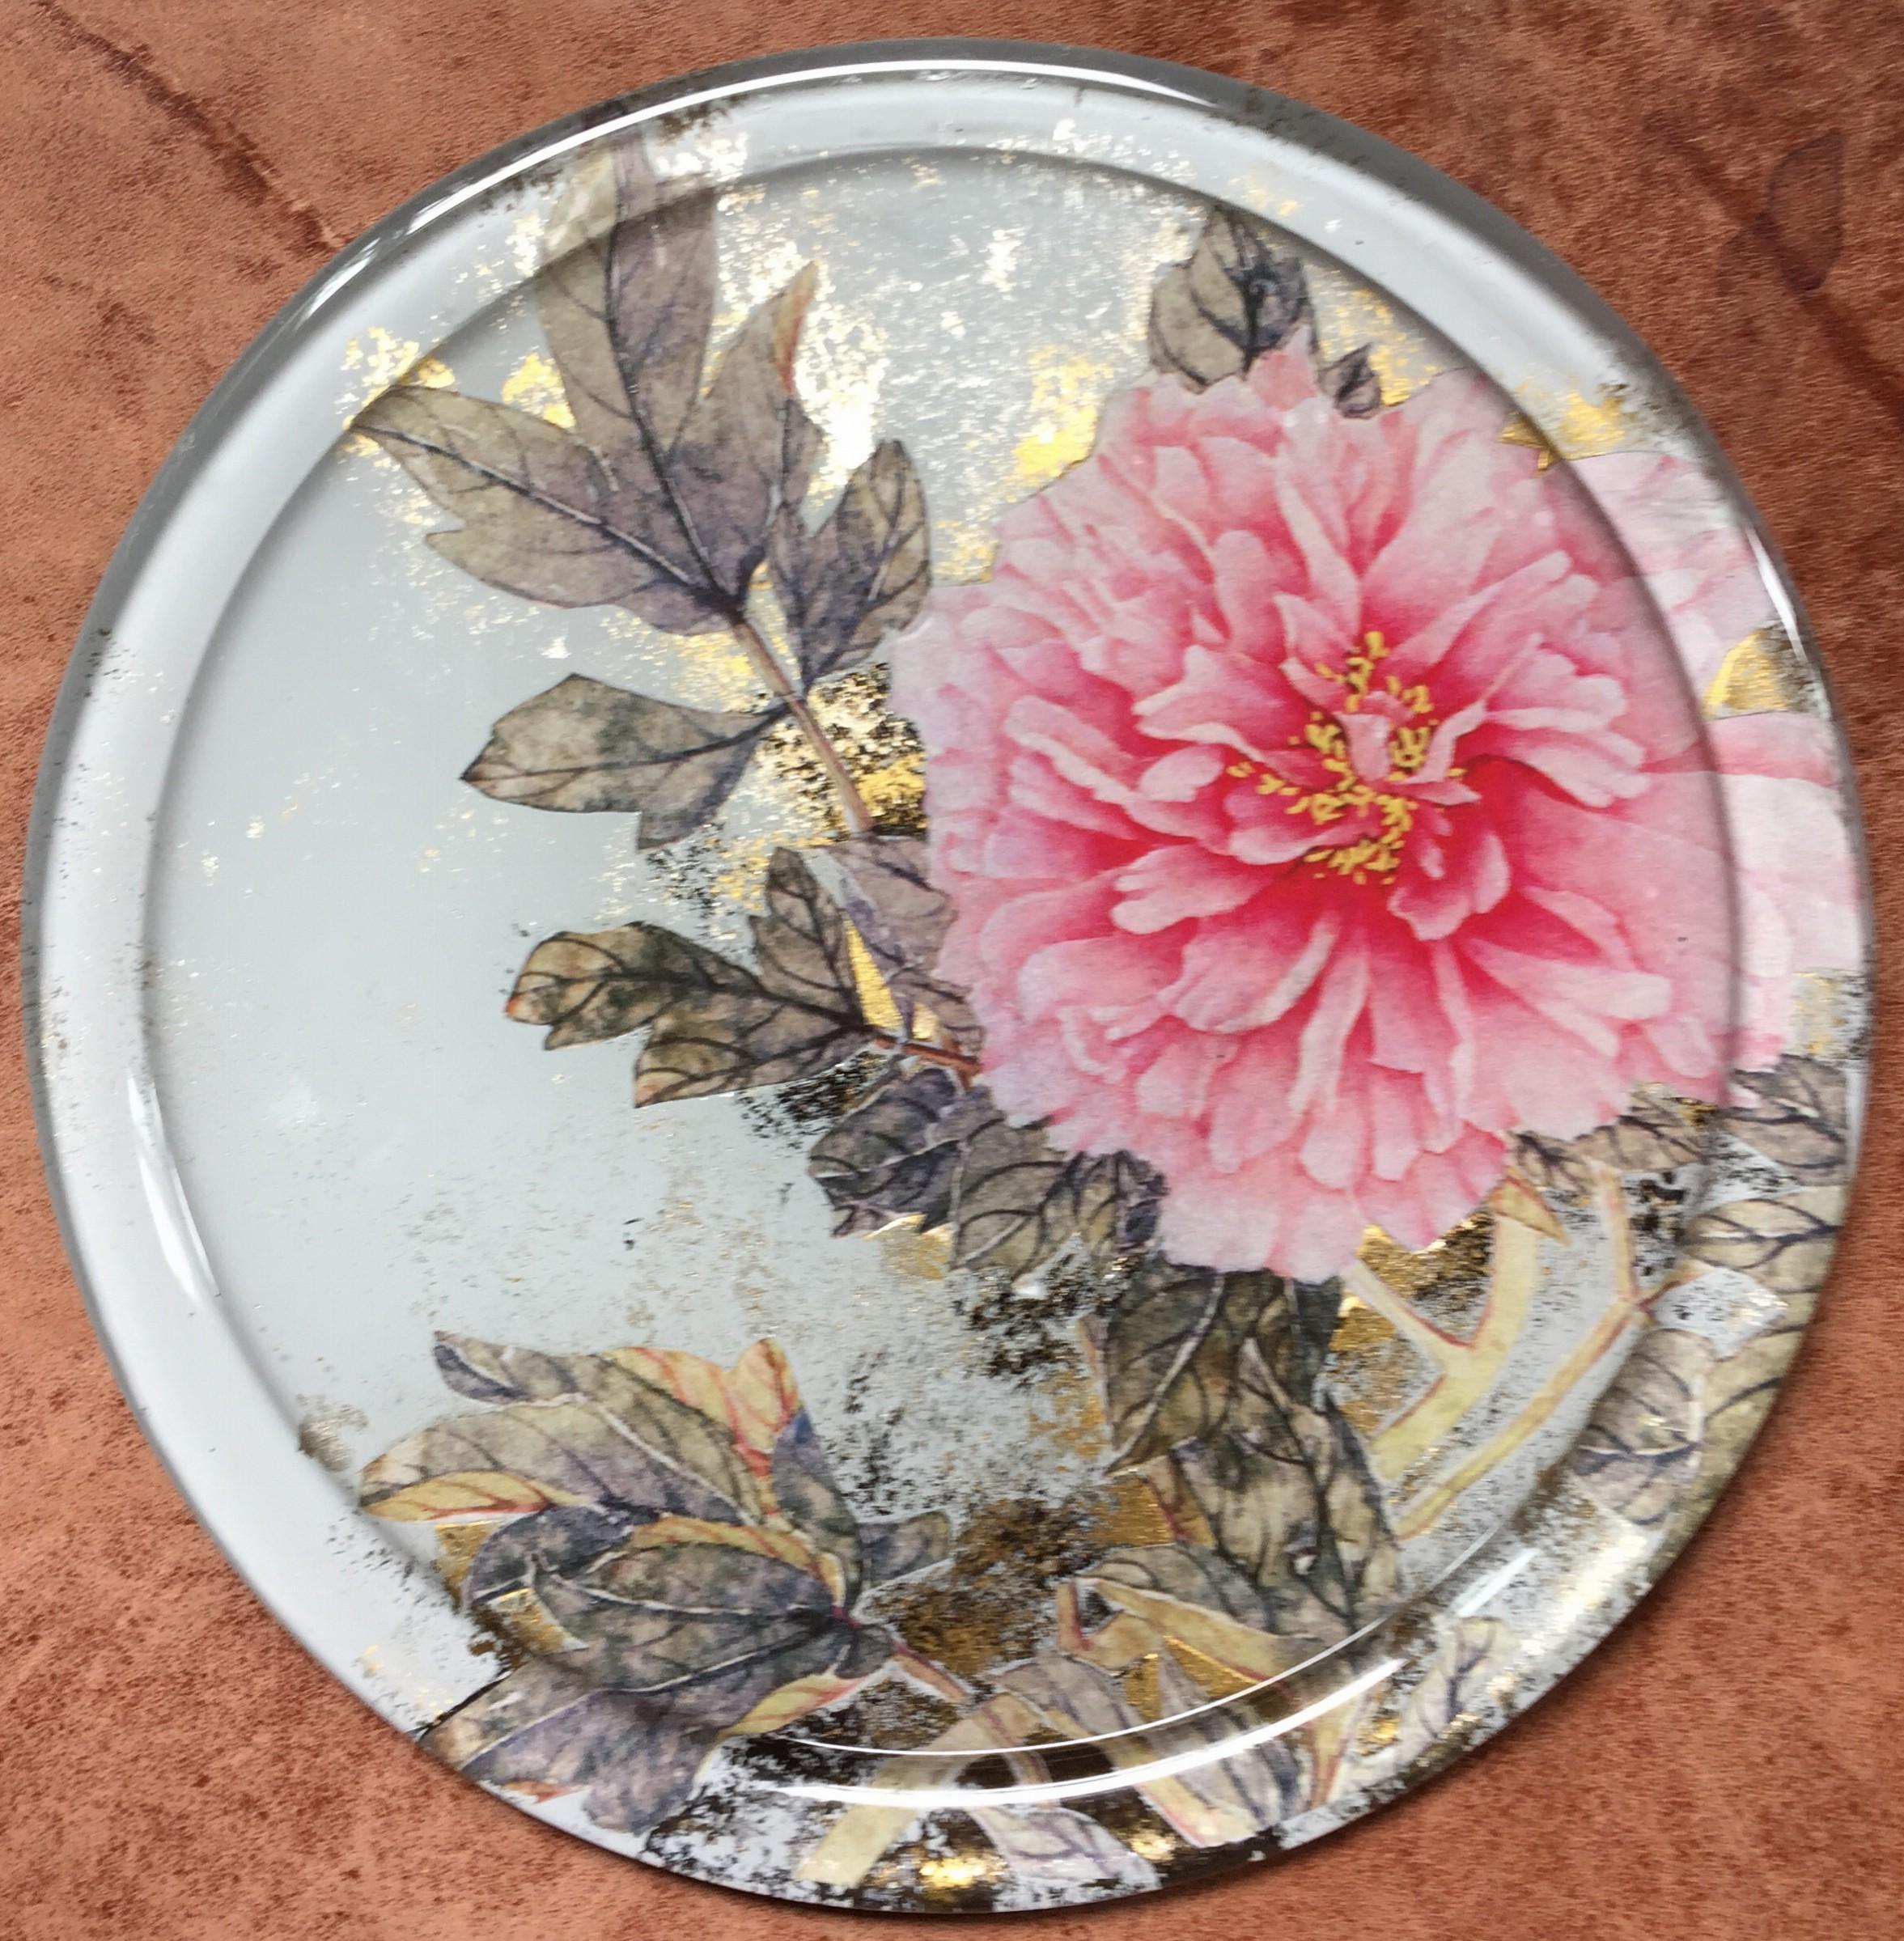 Decopage Glass Plate